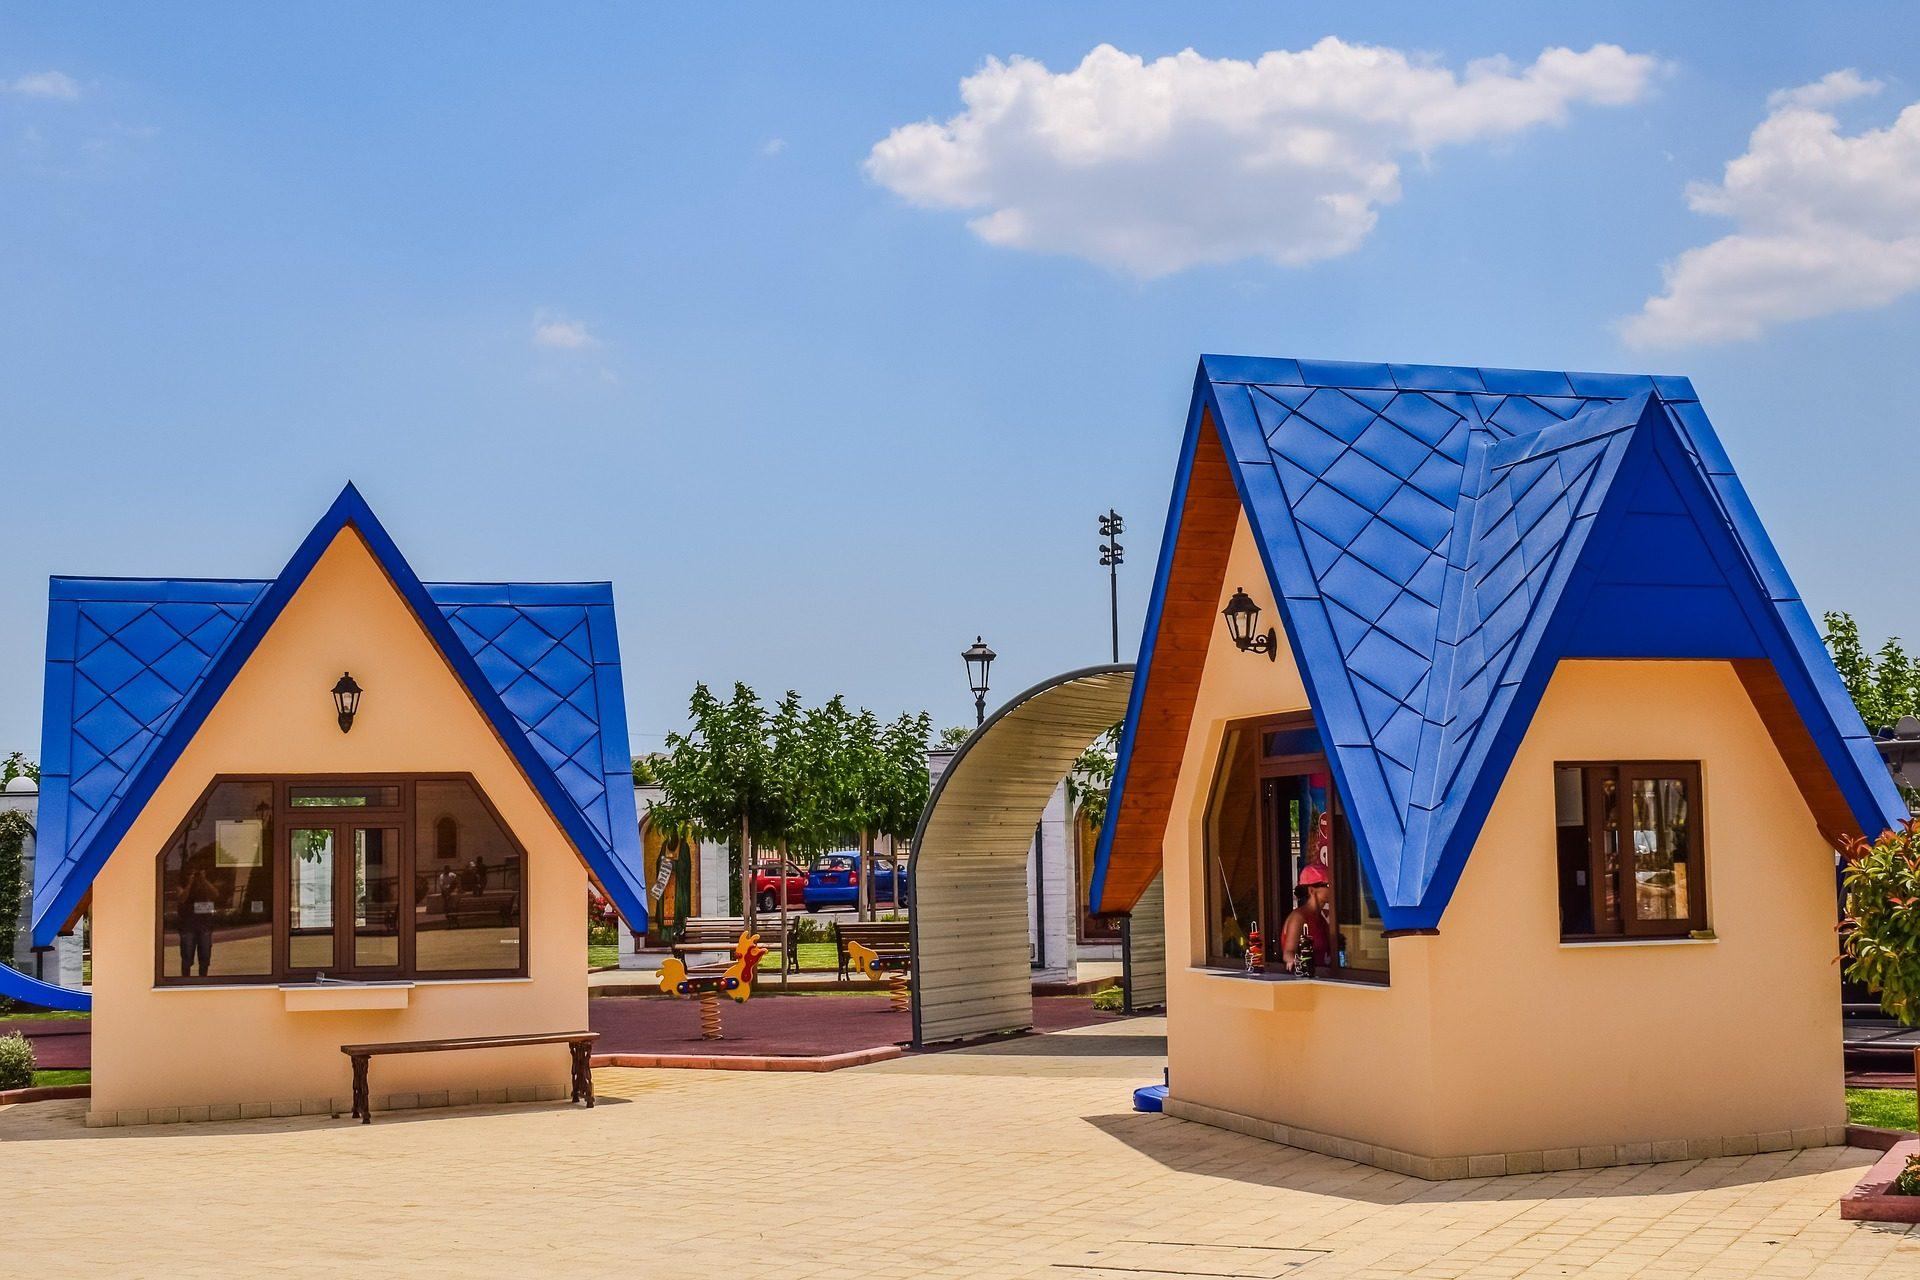 मकान, कीओस्क, पार्क, बच्चे, छतों - HD वॉलपेपर - प्रोफेसर-falken.com